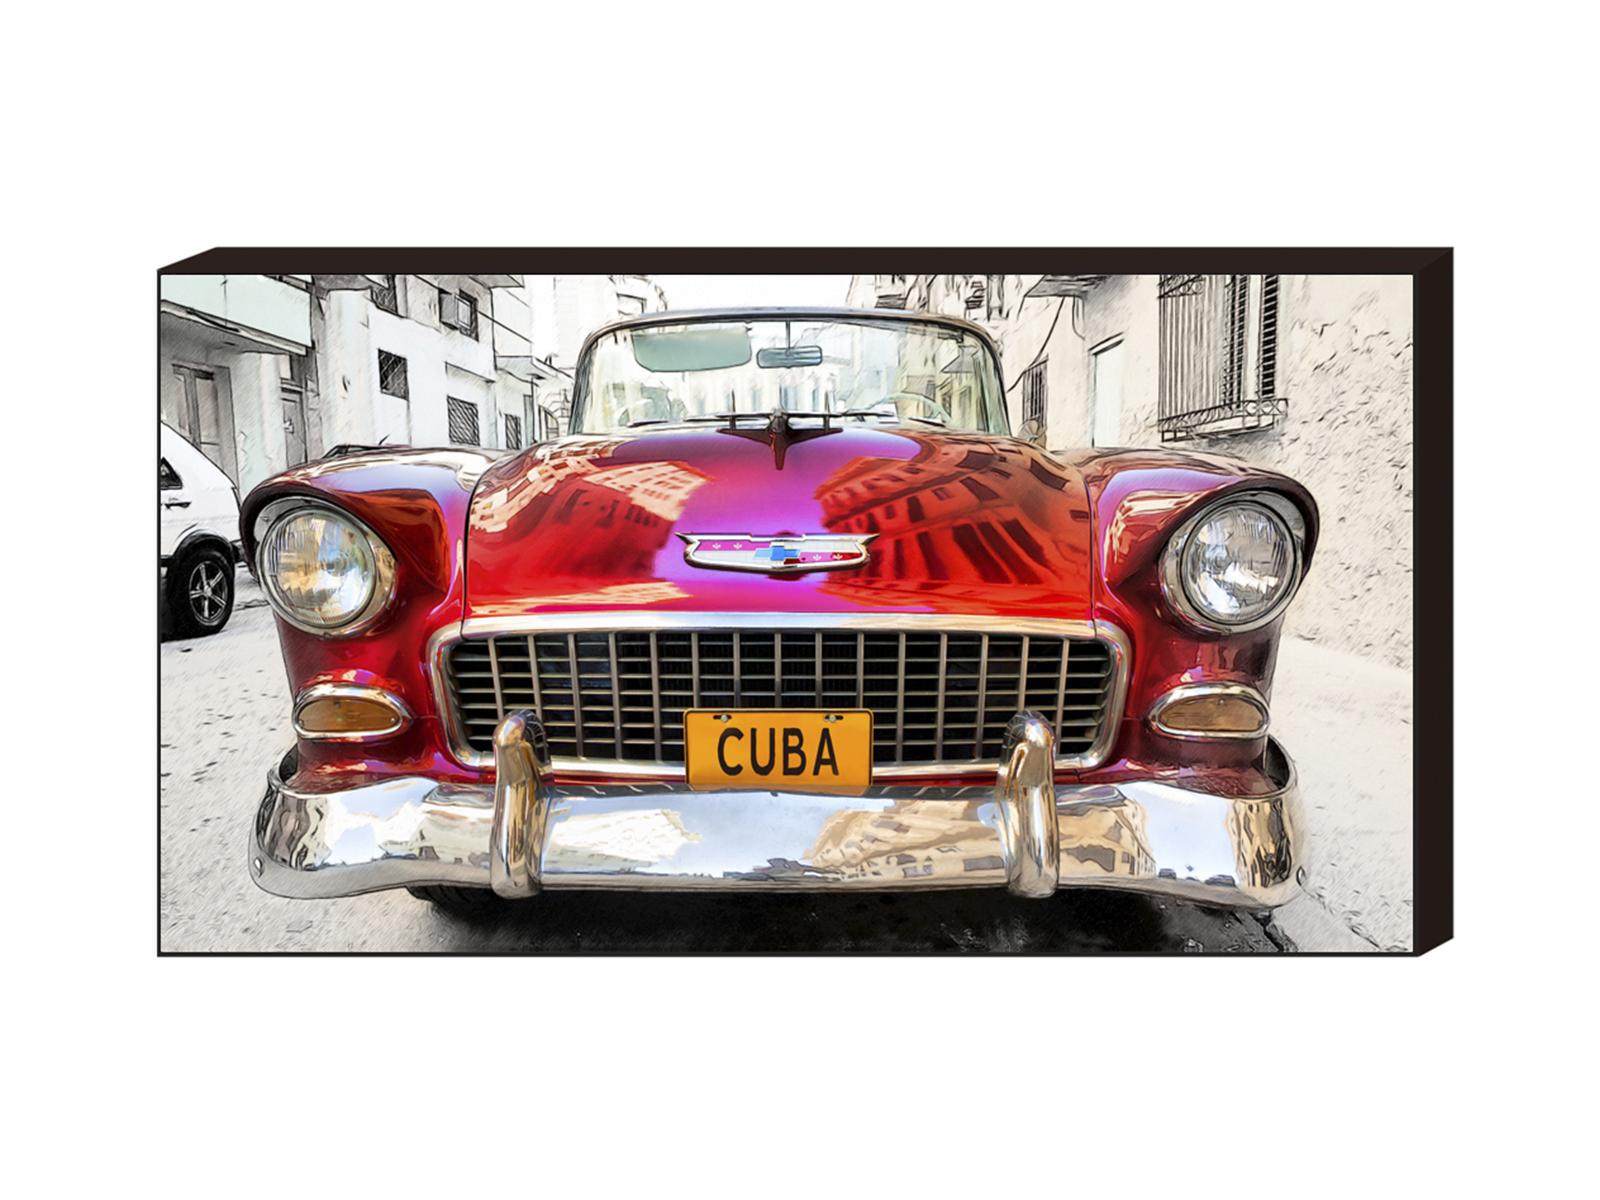 Постер Red Car Cuba, 500х1000 G-1030 ОГОГО Обстановочка!